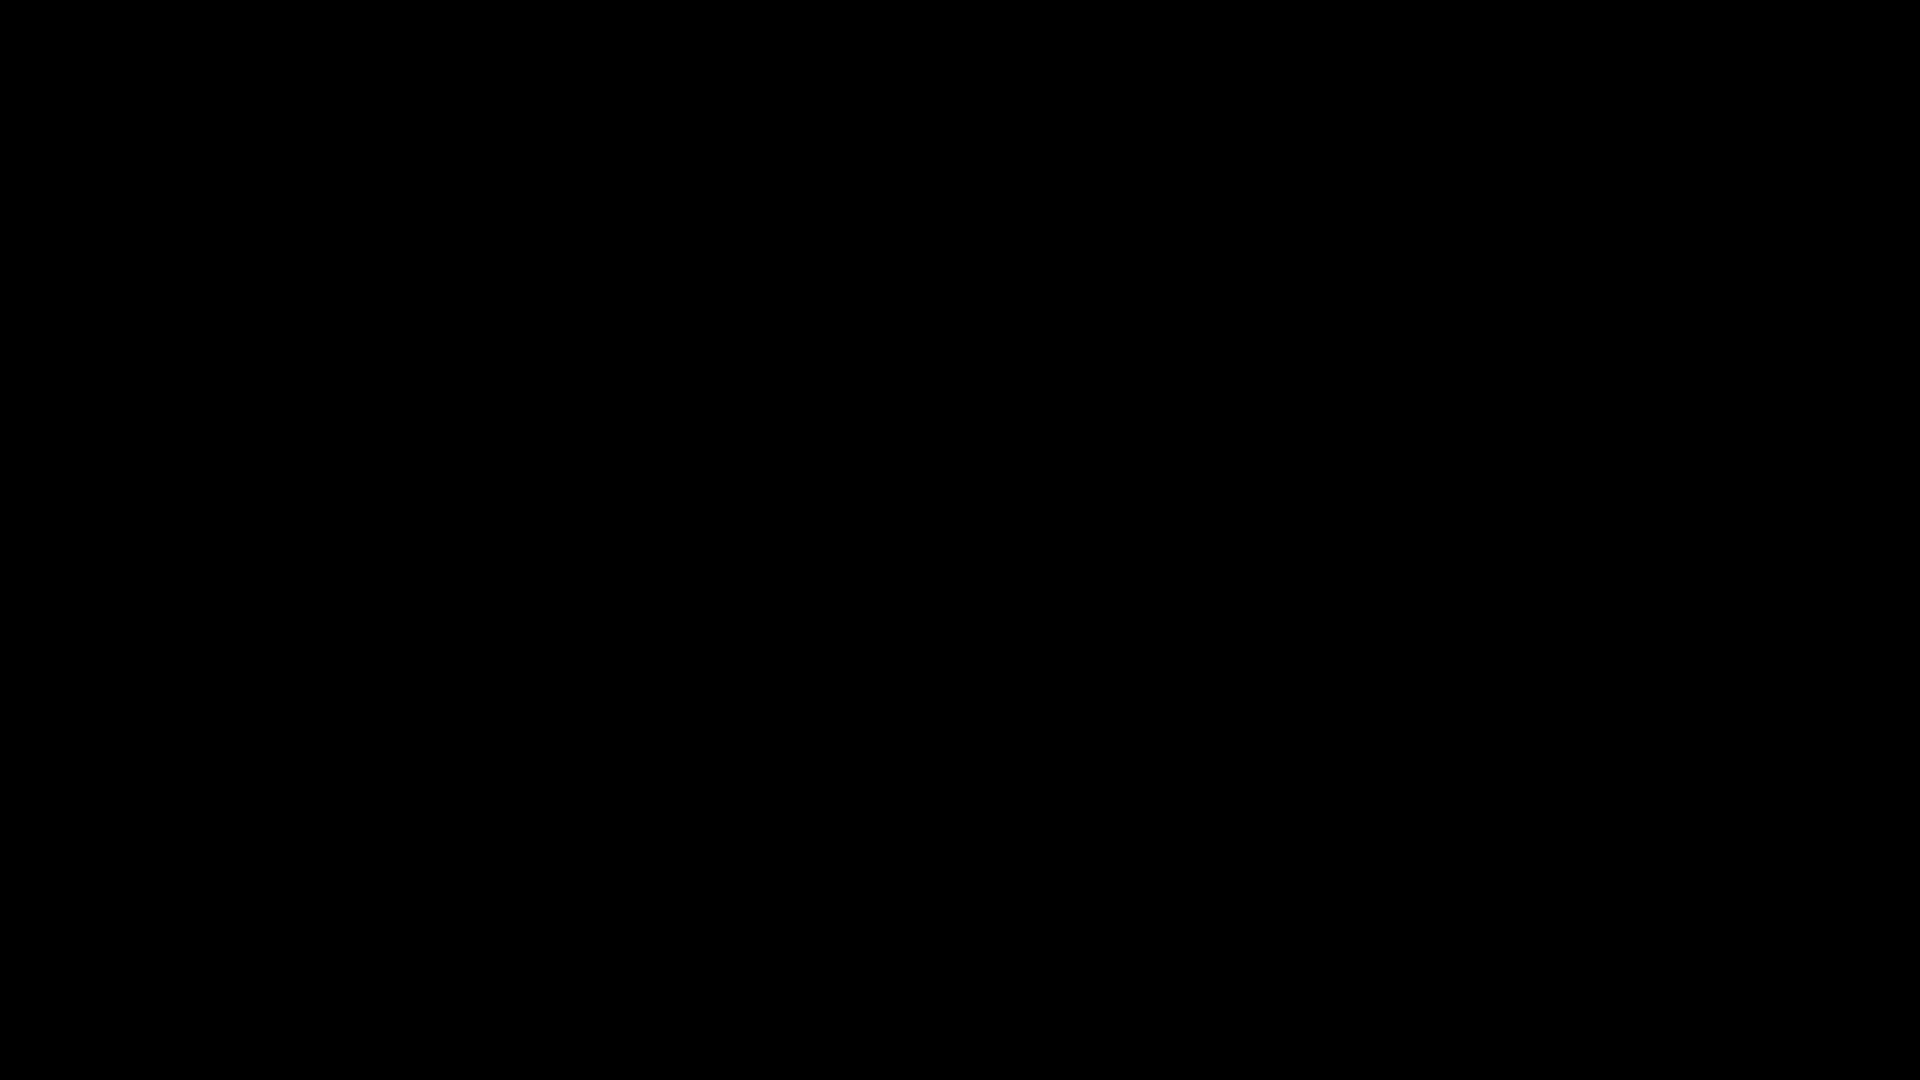 NelioEFI's Placeholder